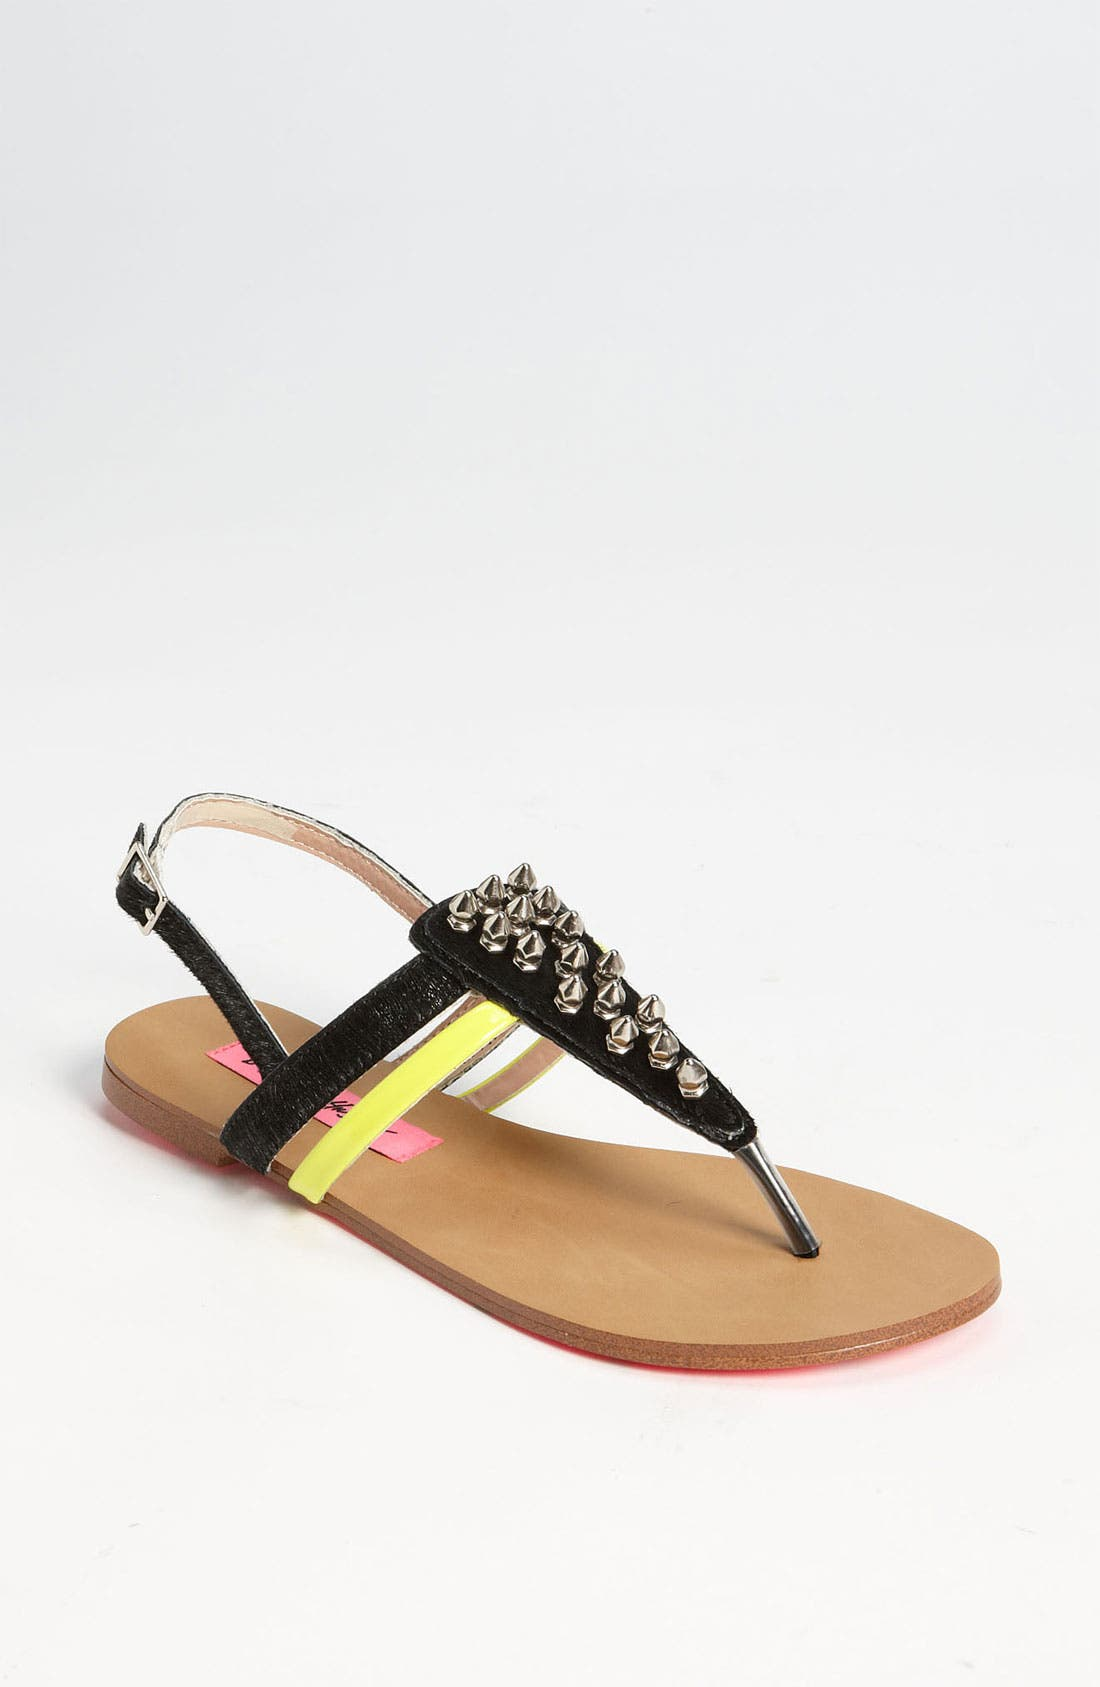 Main Image - Betsey Johnson 'Corii' Sandal